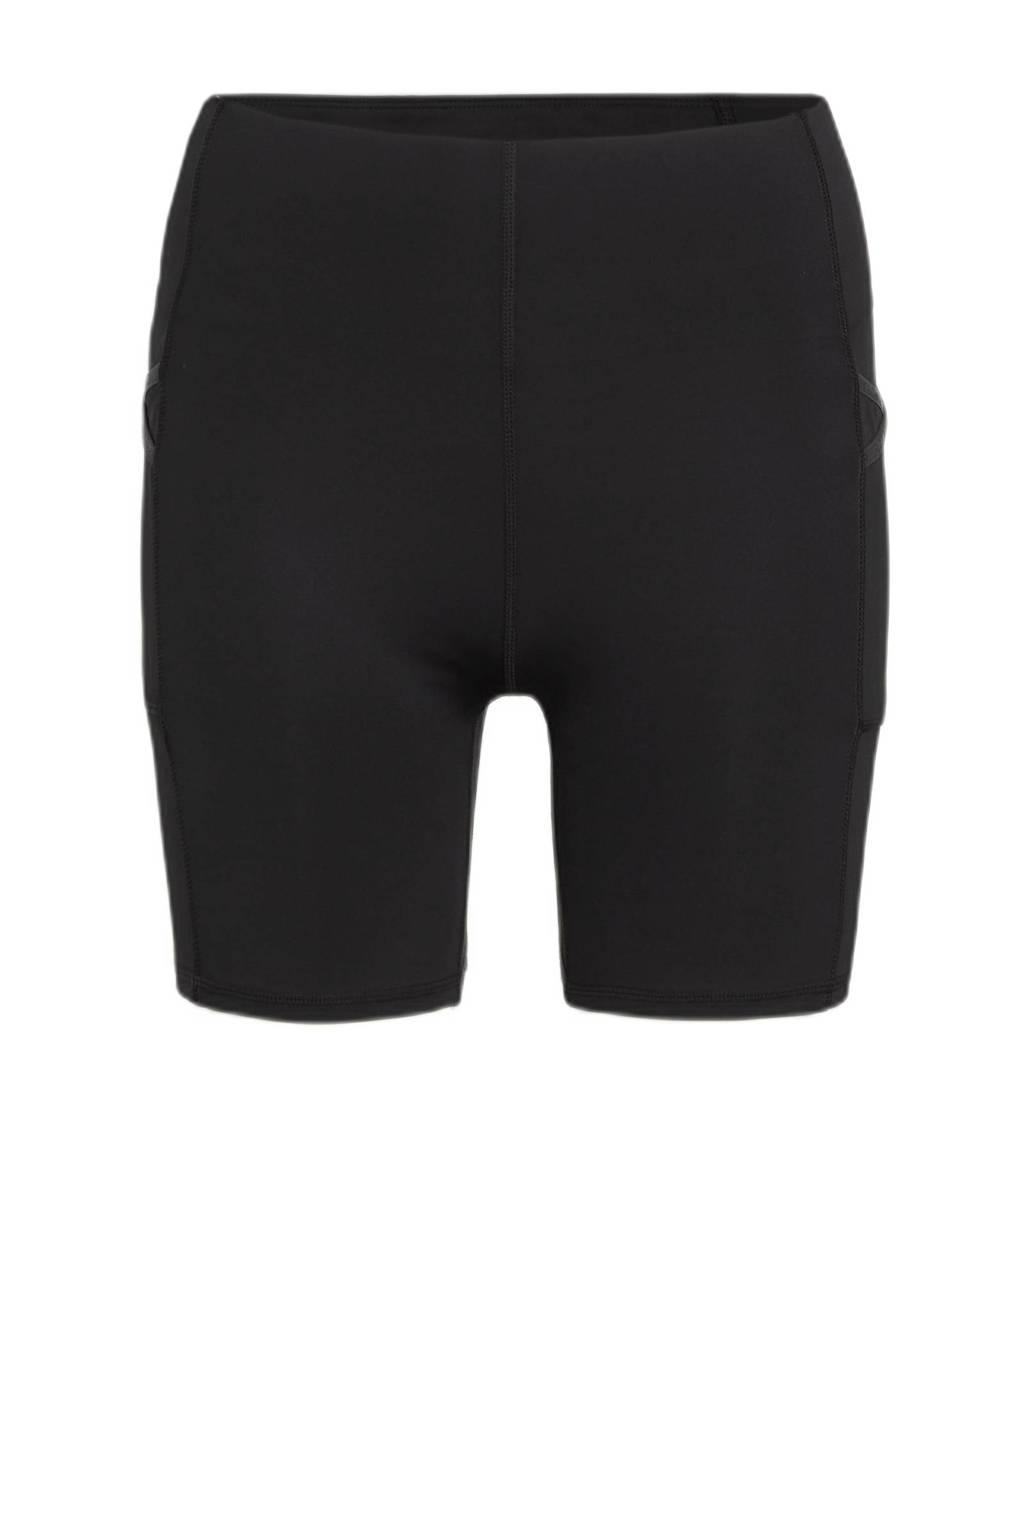 Superdry Sport hardloopshort zwart, Zwart